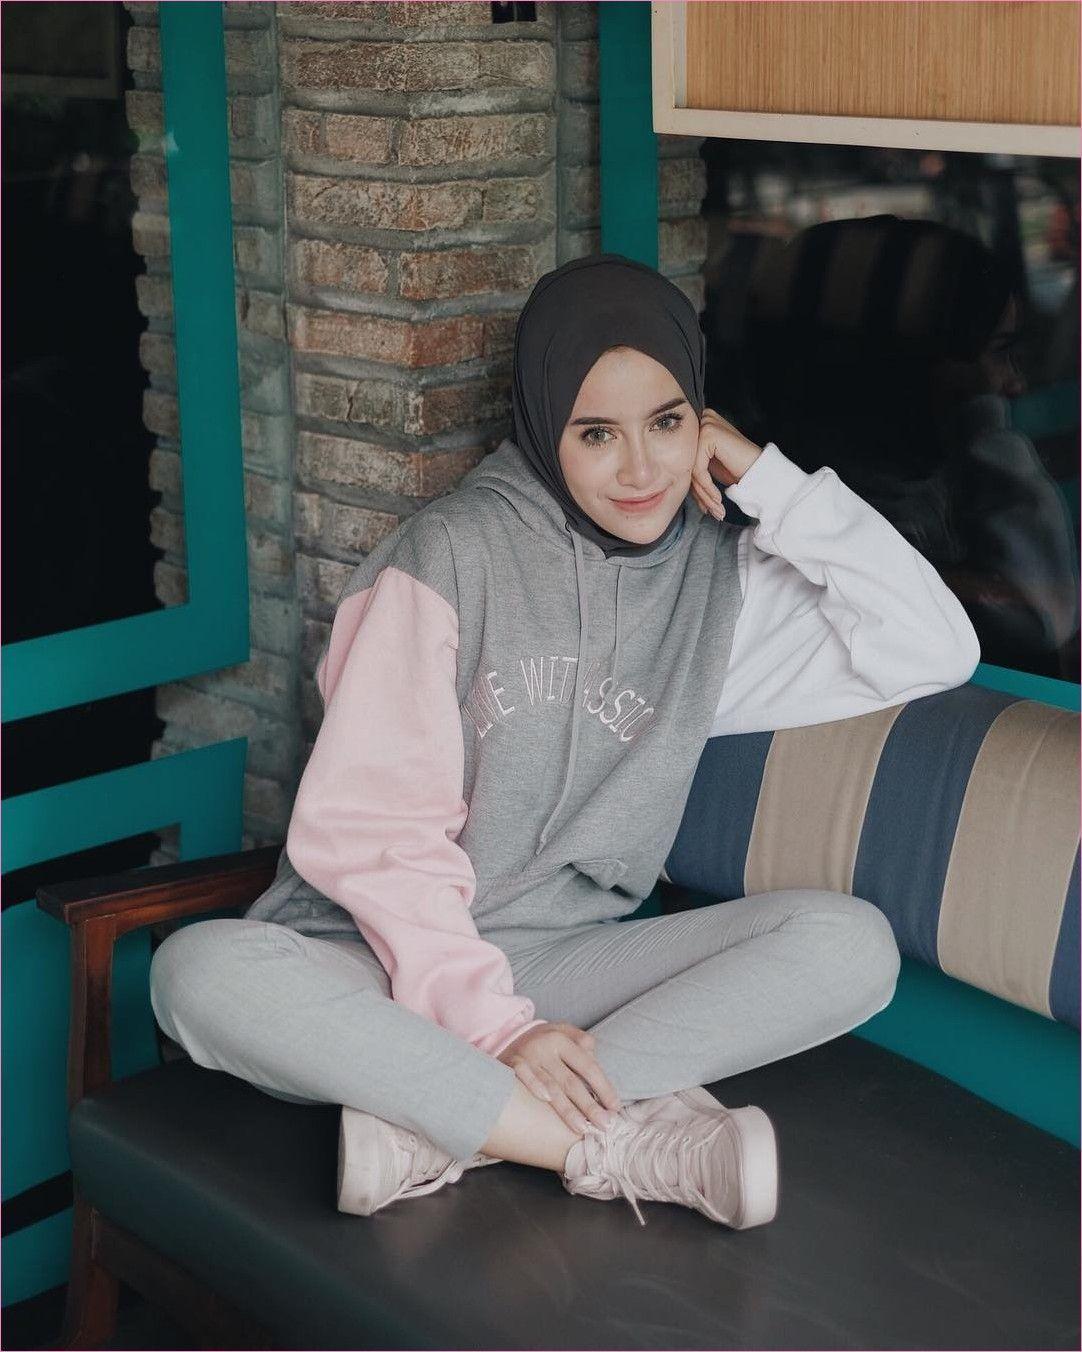 Outfit Baju Hijab Casual Untuk Olahraga Ala Selebgram 2018 Sneakers Kets Sepatu Olahraga Turban Jaket Hoodi Sports Clothes Fashion Sport Outfits Hoodie Fashion